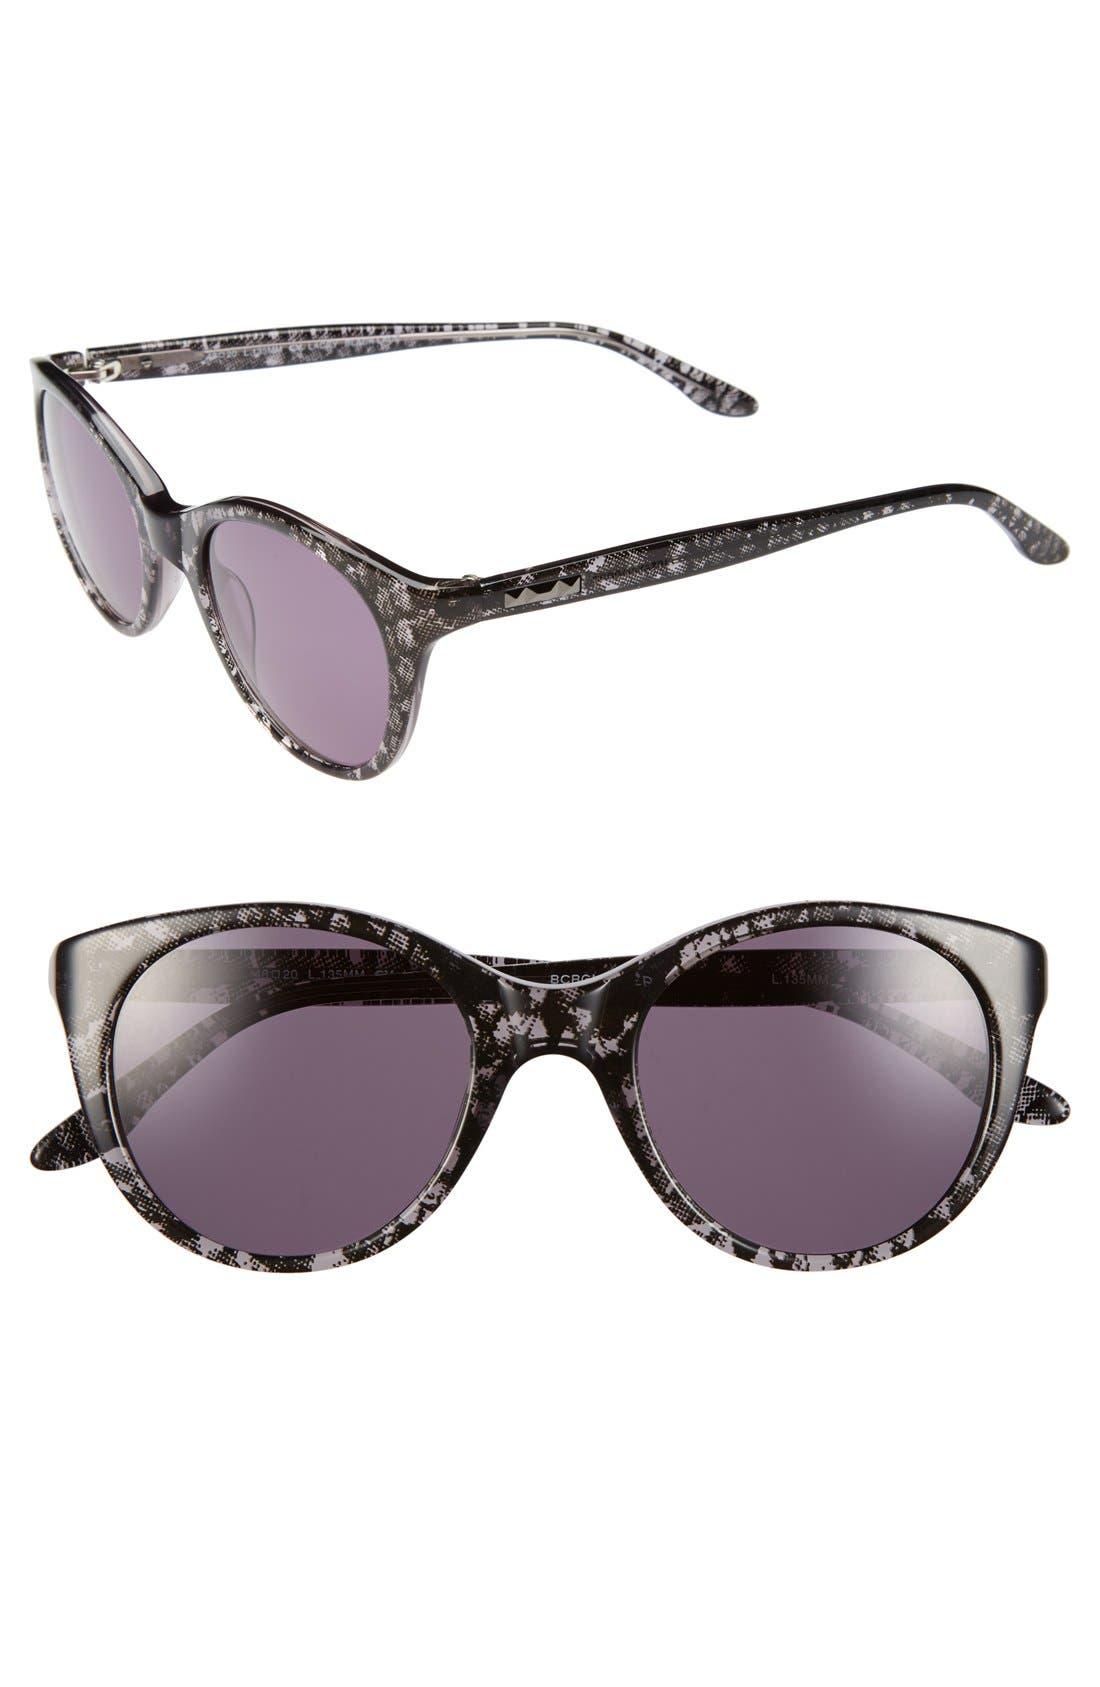 Alternate Image 1 Selected - BCBGMAXAZRIA 'Lacey' 48mm Sunglasses